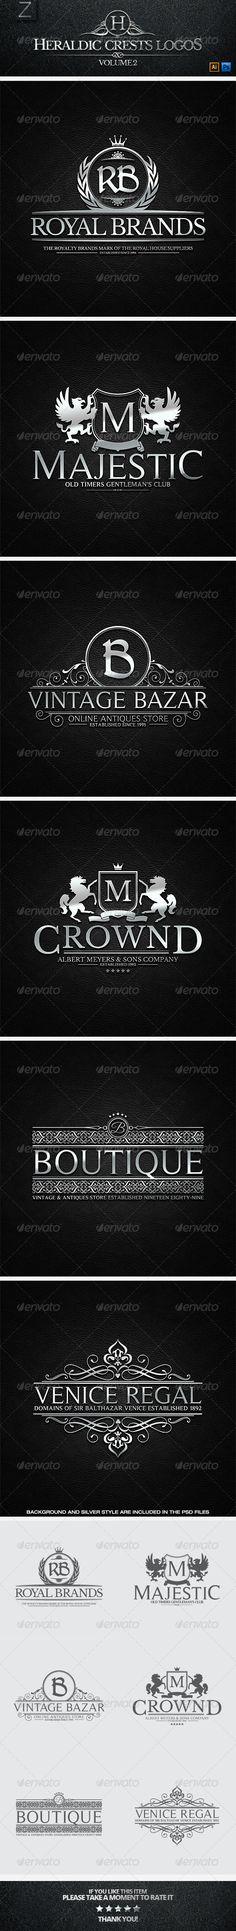 Heraldic Crest Logos Template | Buy and Download: http://graphicriver.net/item/heraldic-crest-logos-vol2/7472402?WT.ac=category_thumb&WT.z_author=Alex_Zeppelin&ref=ksioks